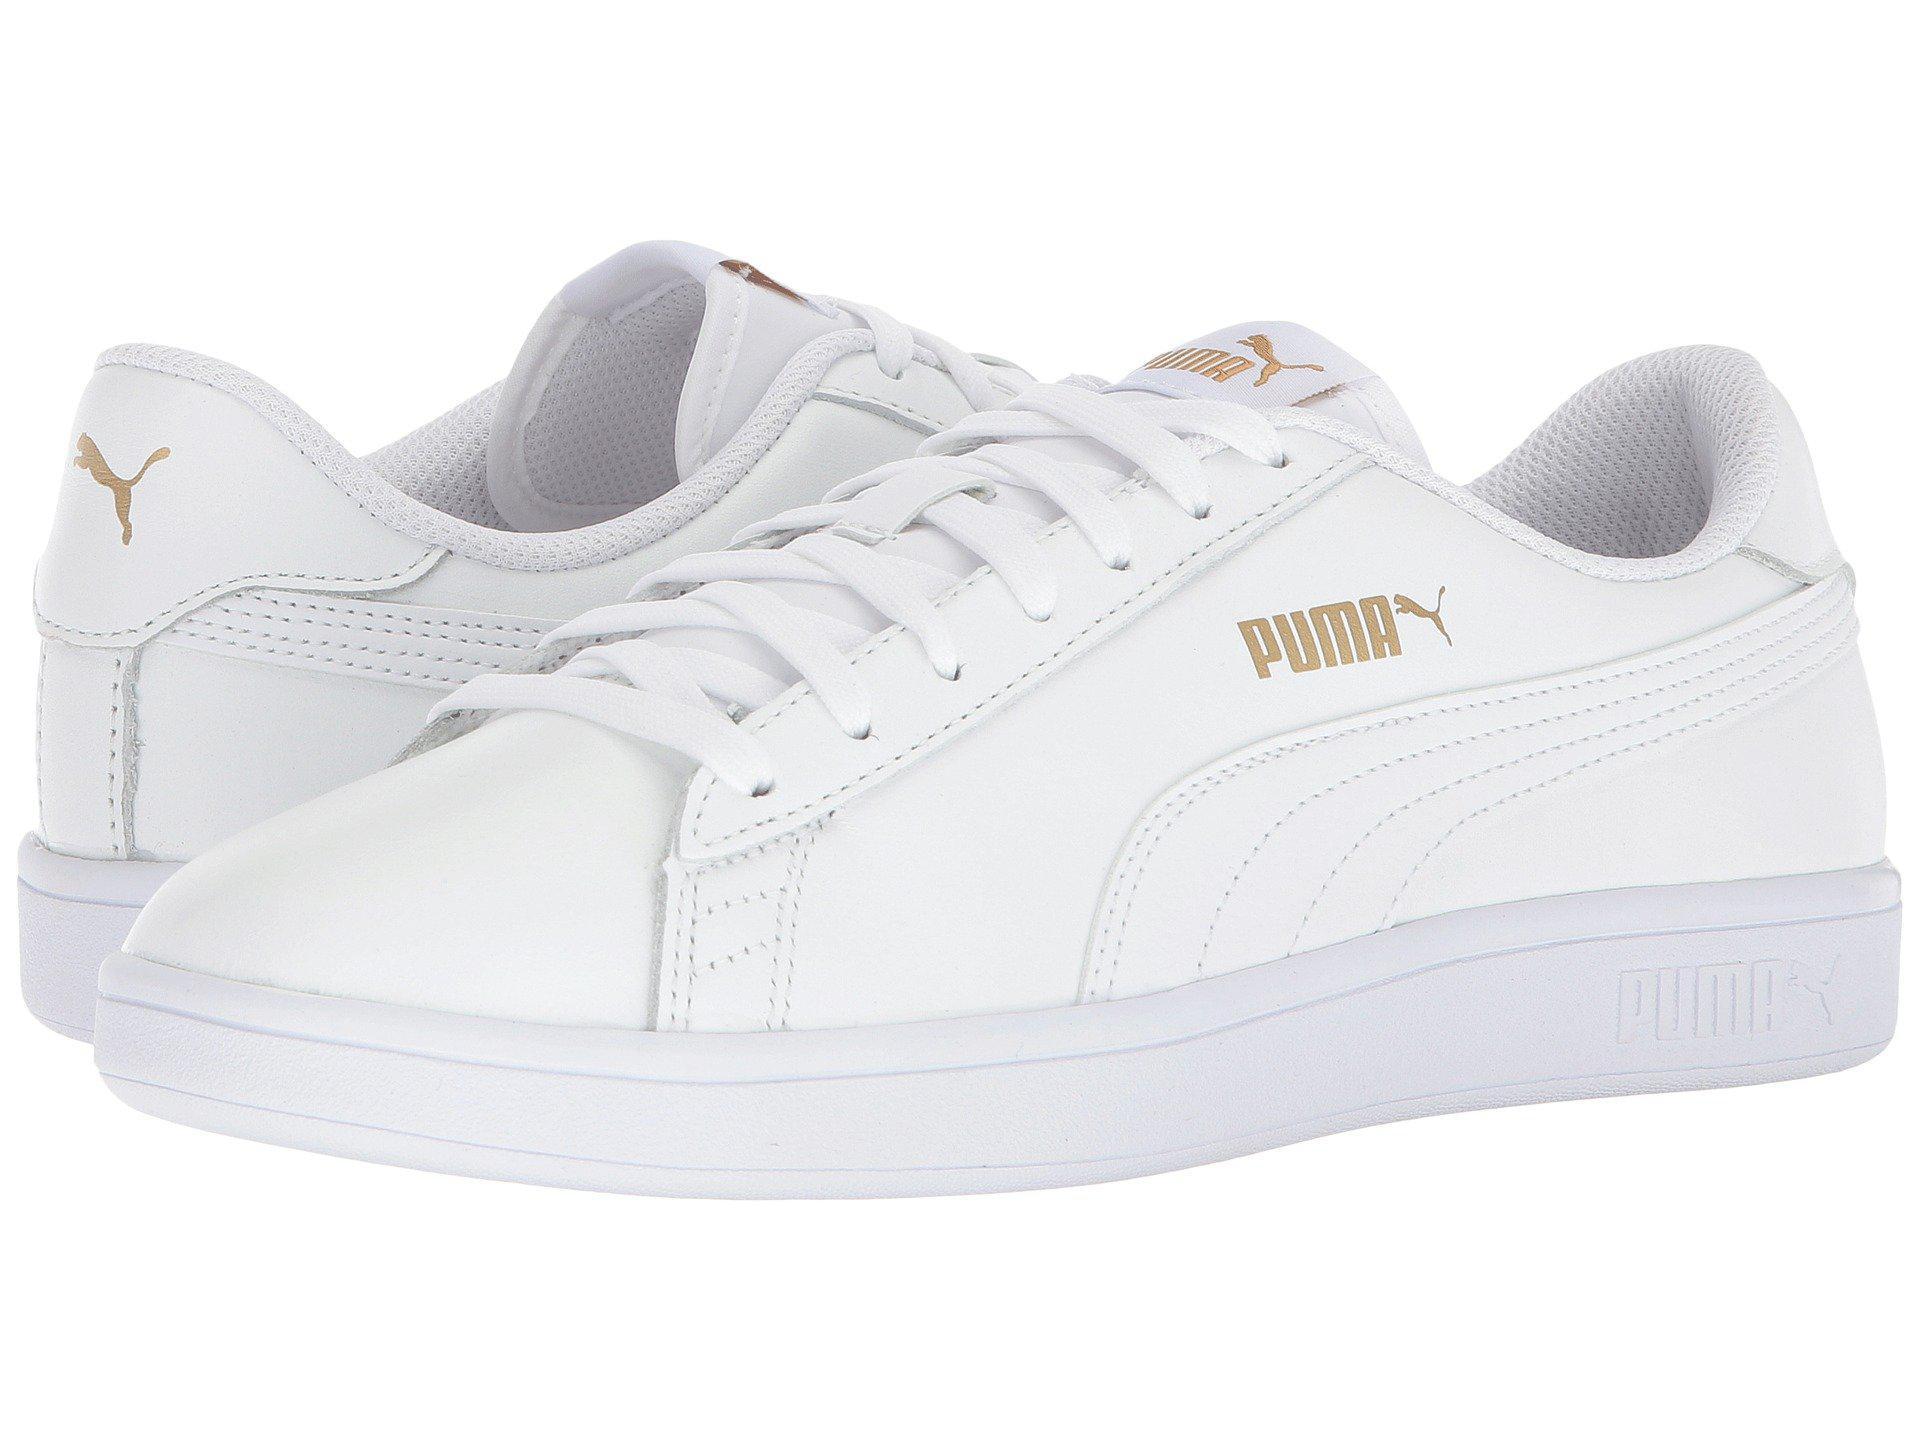 9d7432d1dc3 Lyst - PUMA Smash V2 L Plus in White for Men